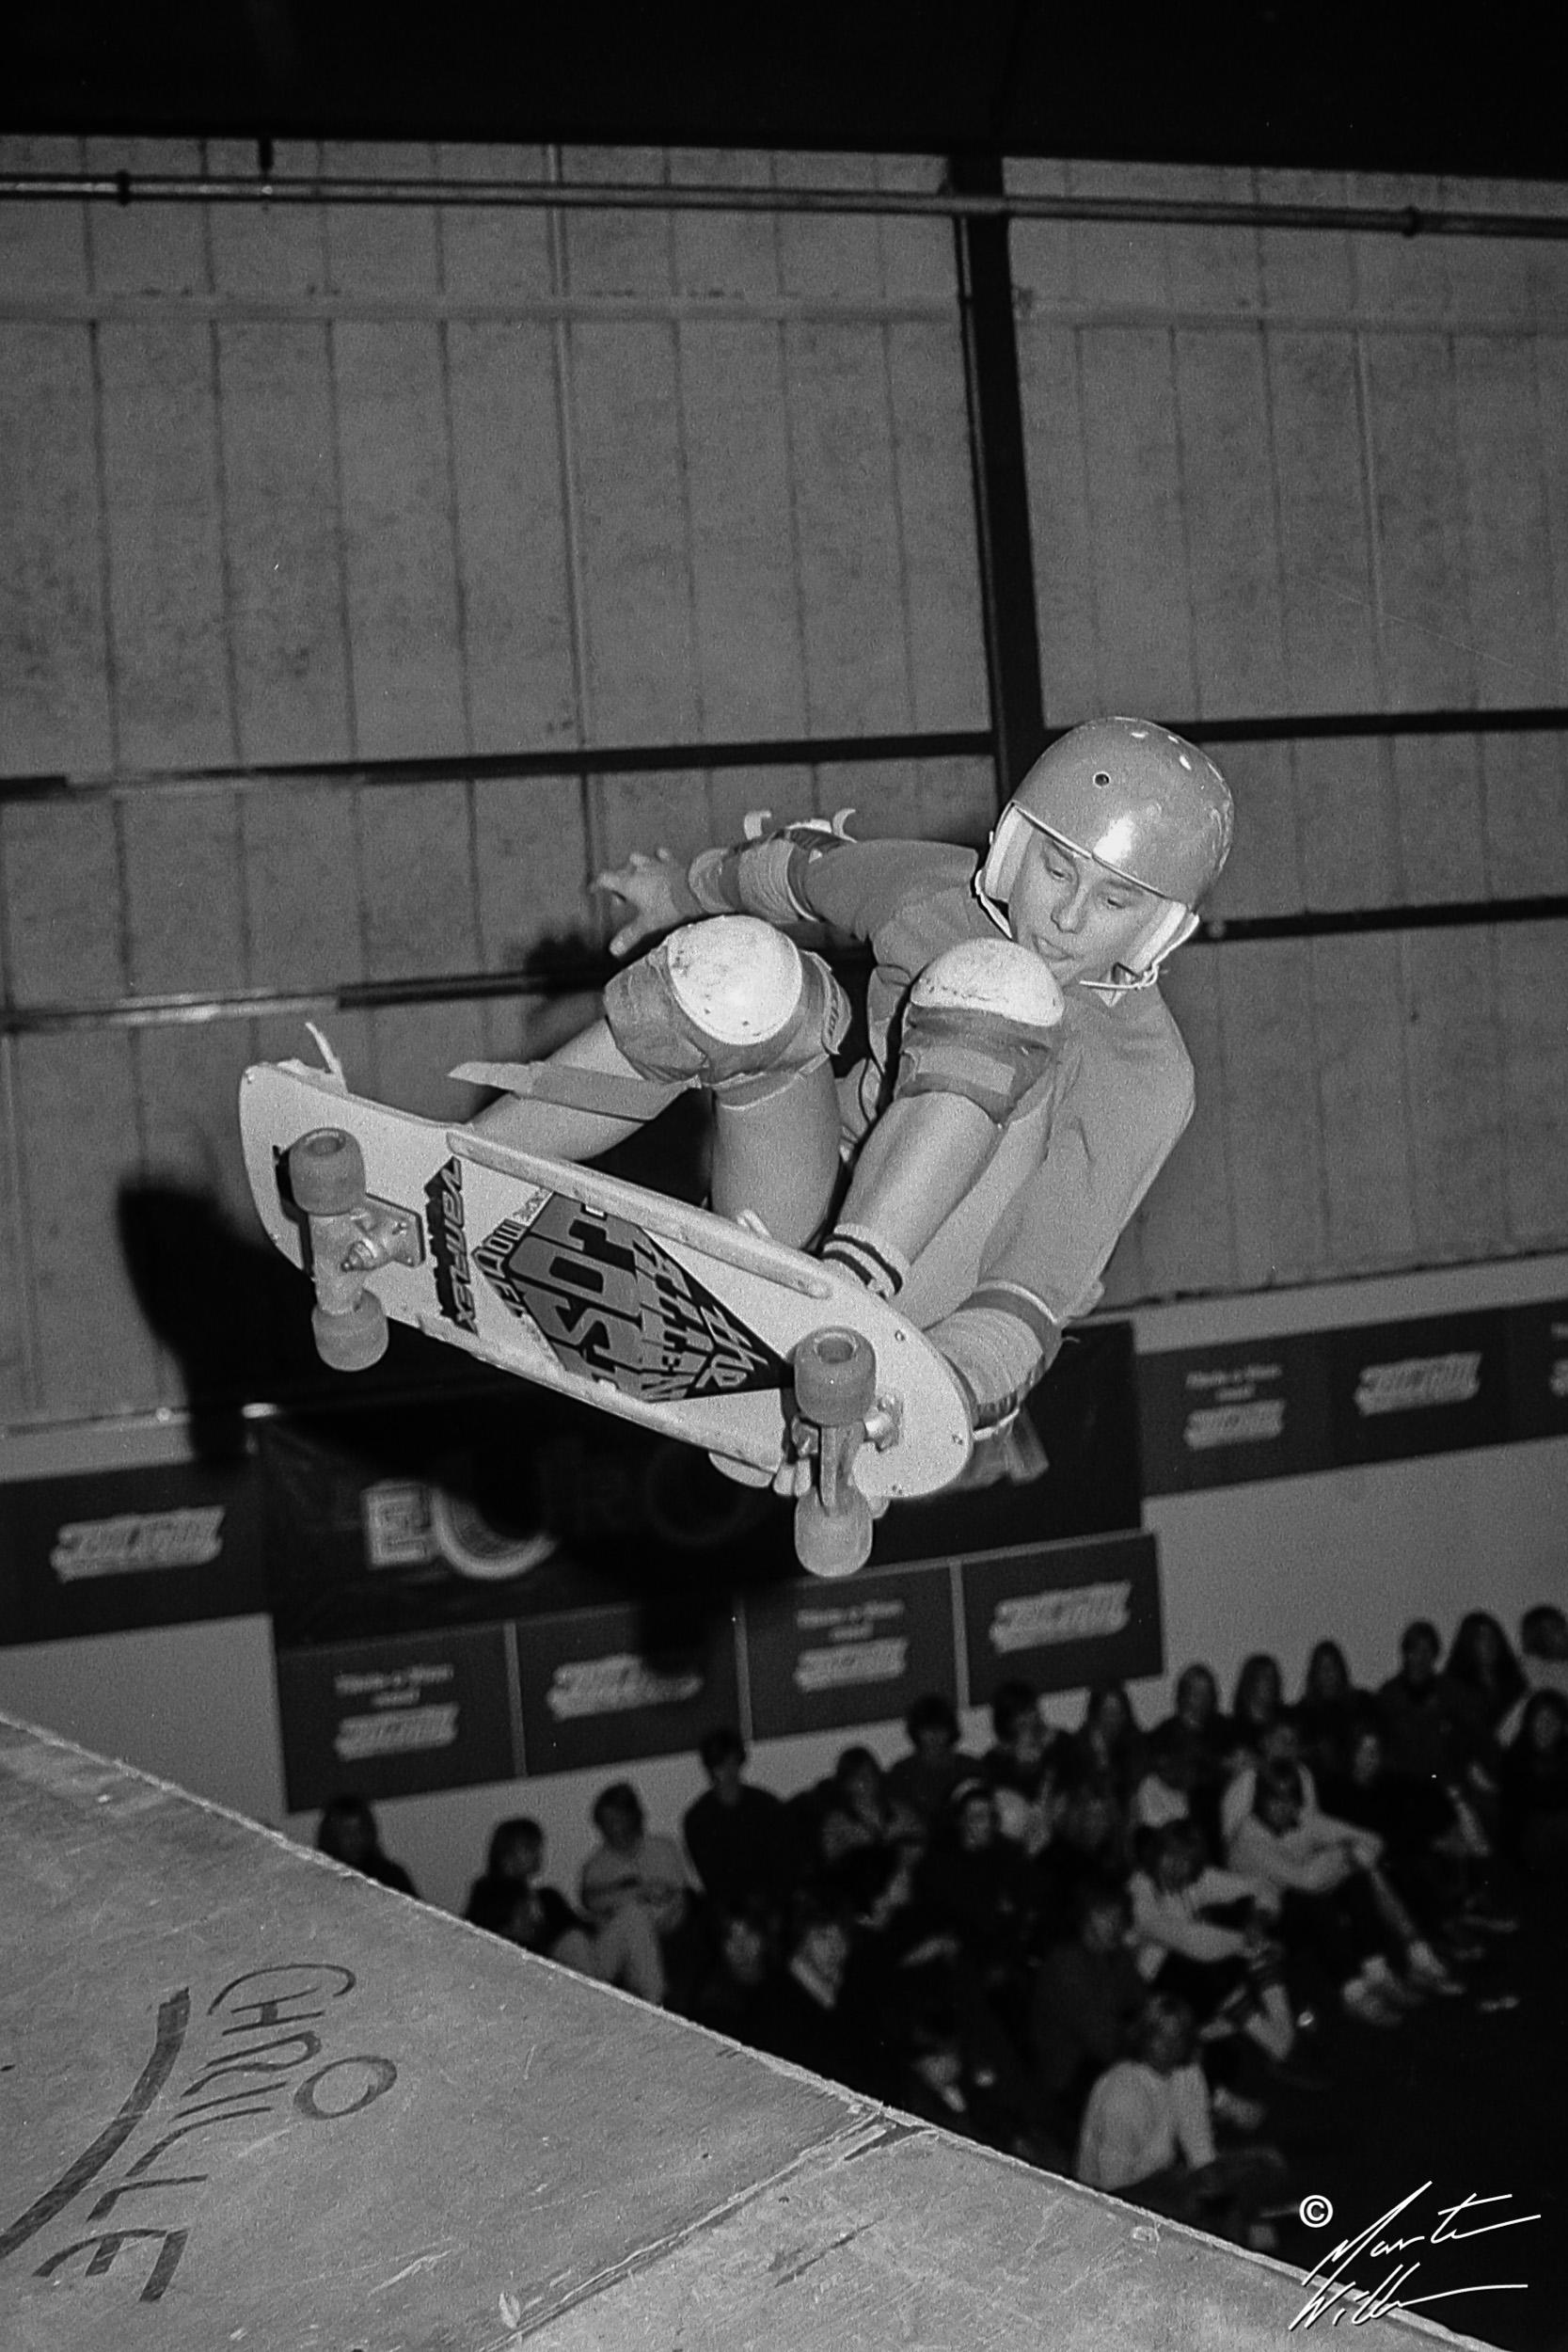 Mikael Adolfsson, Lien air, Eurocana Open, Stockholm 1982